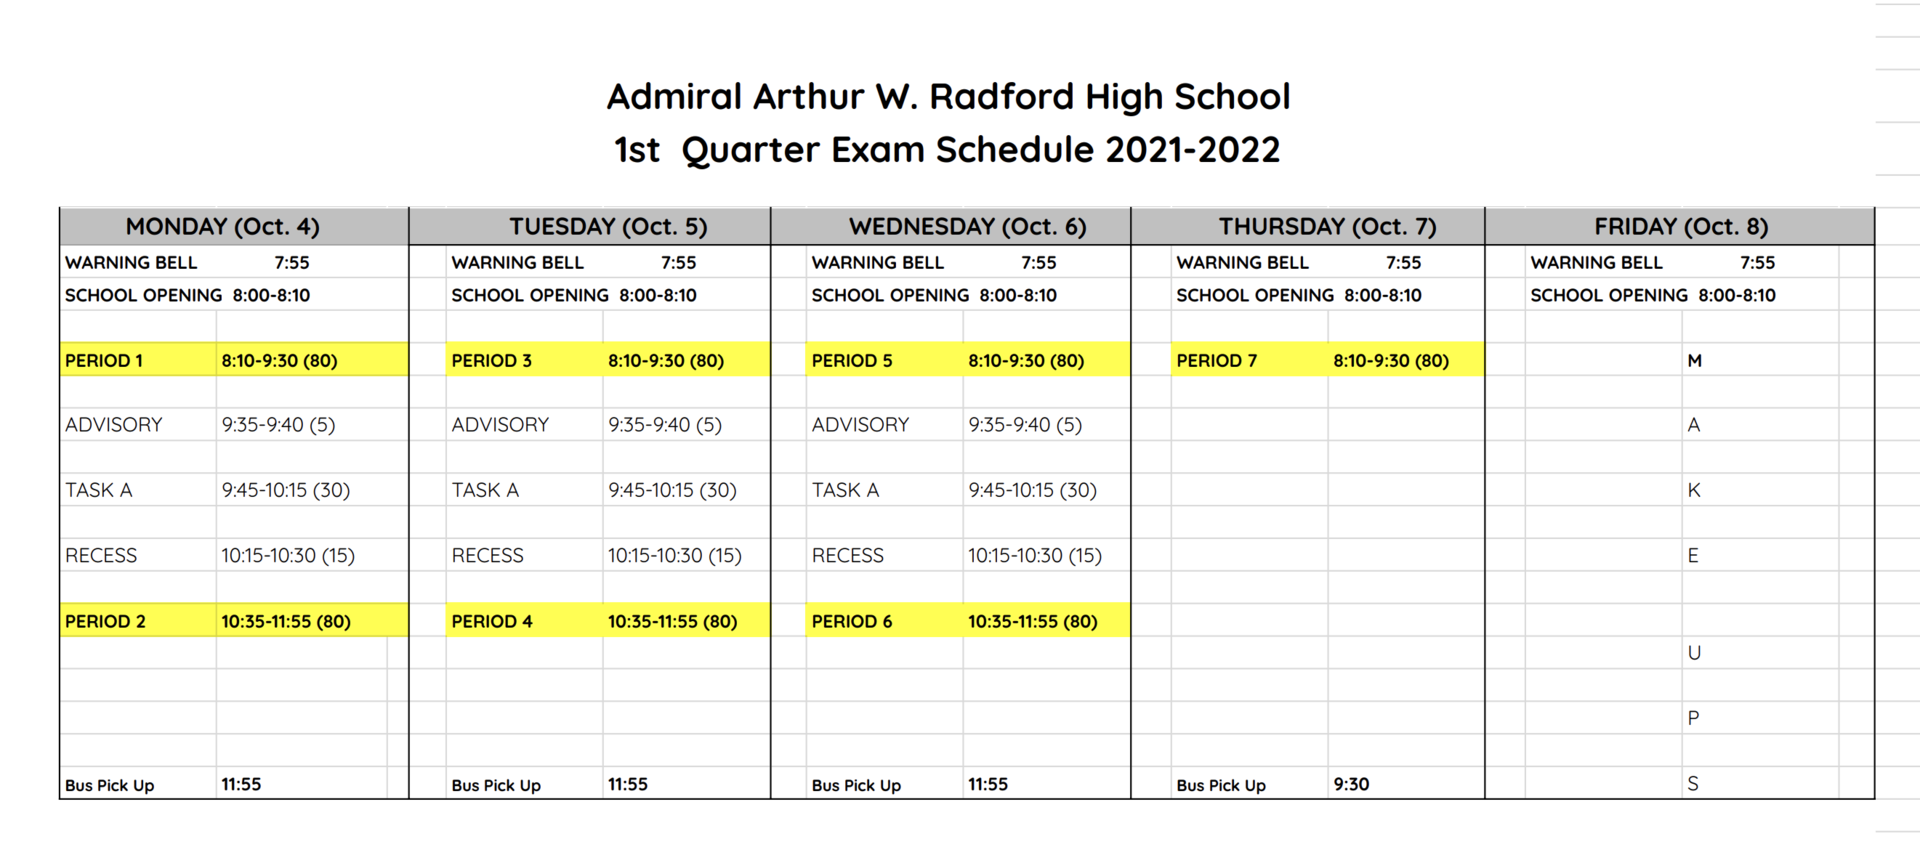 exam schedule picture